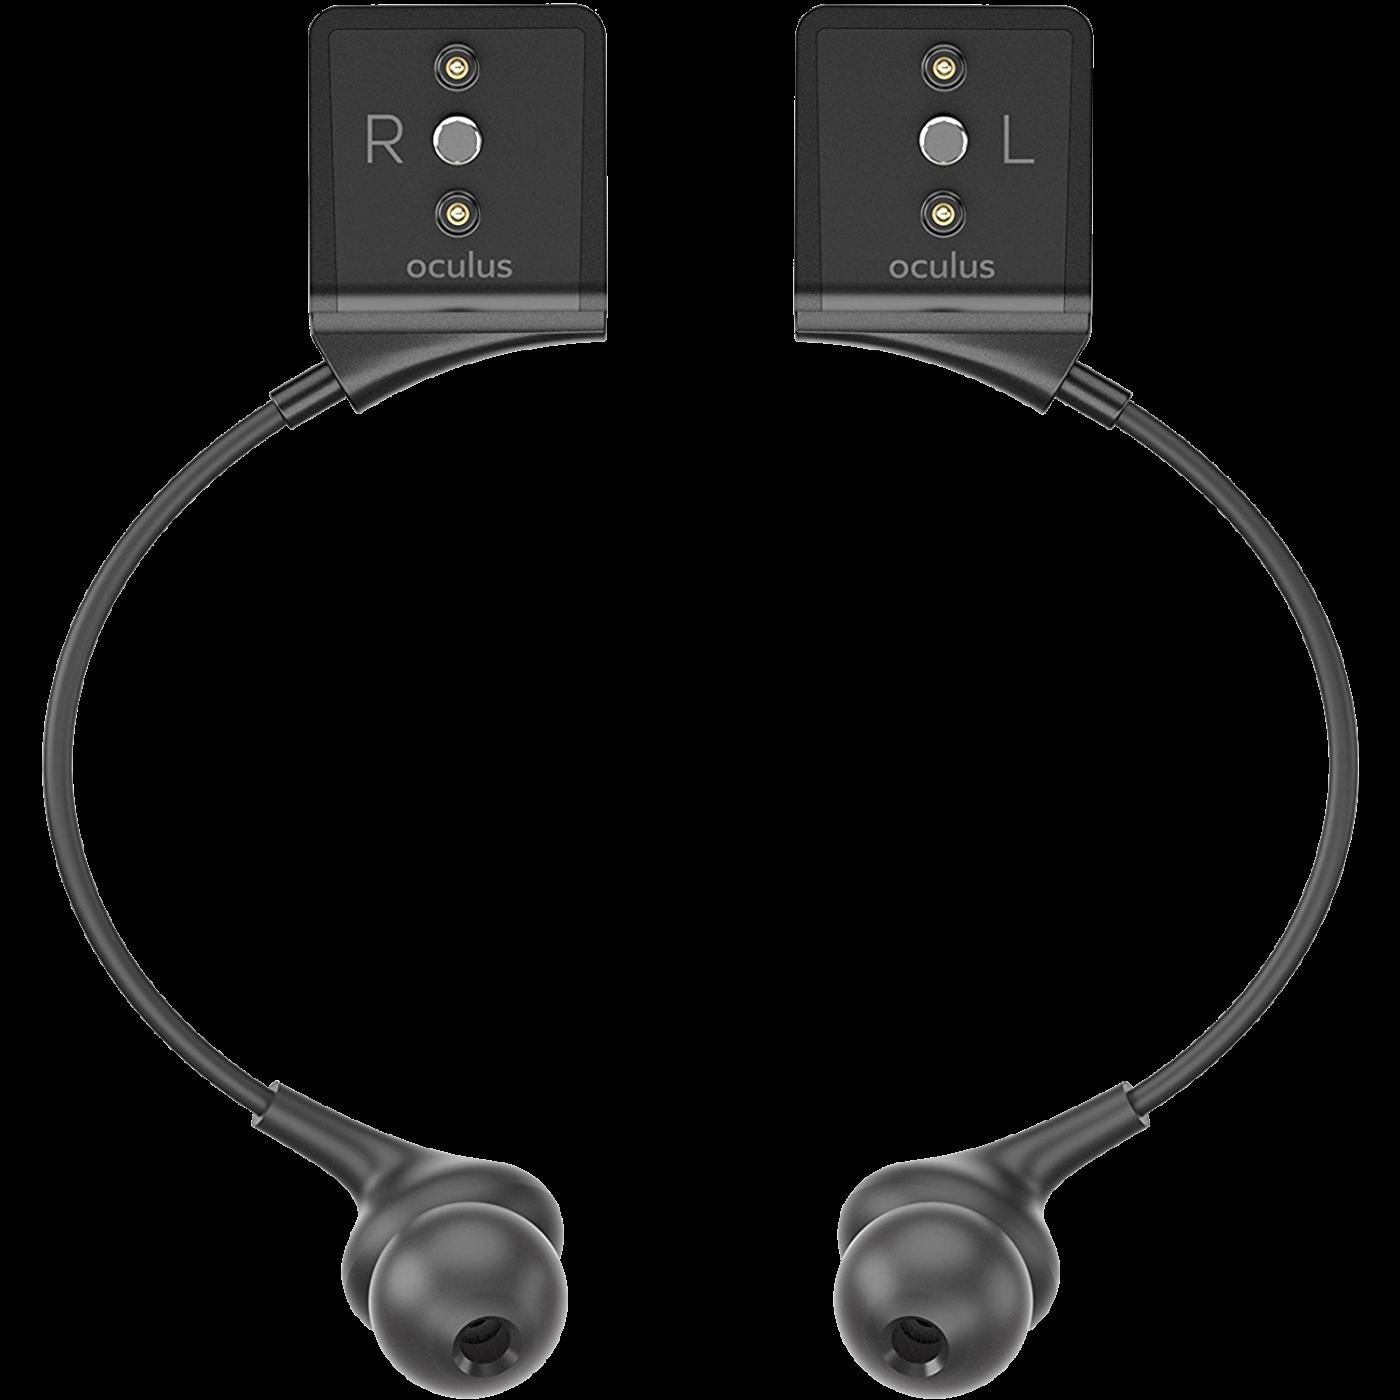 Oculus Rift in-ear headphones